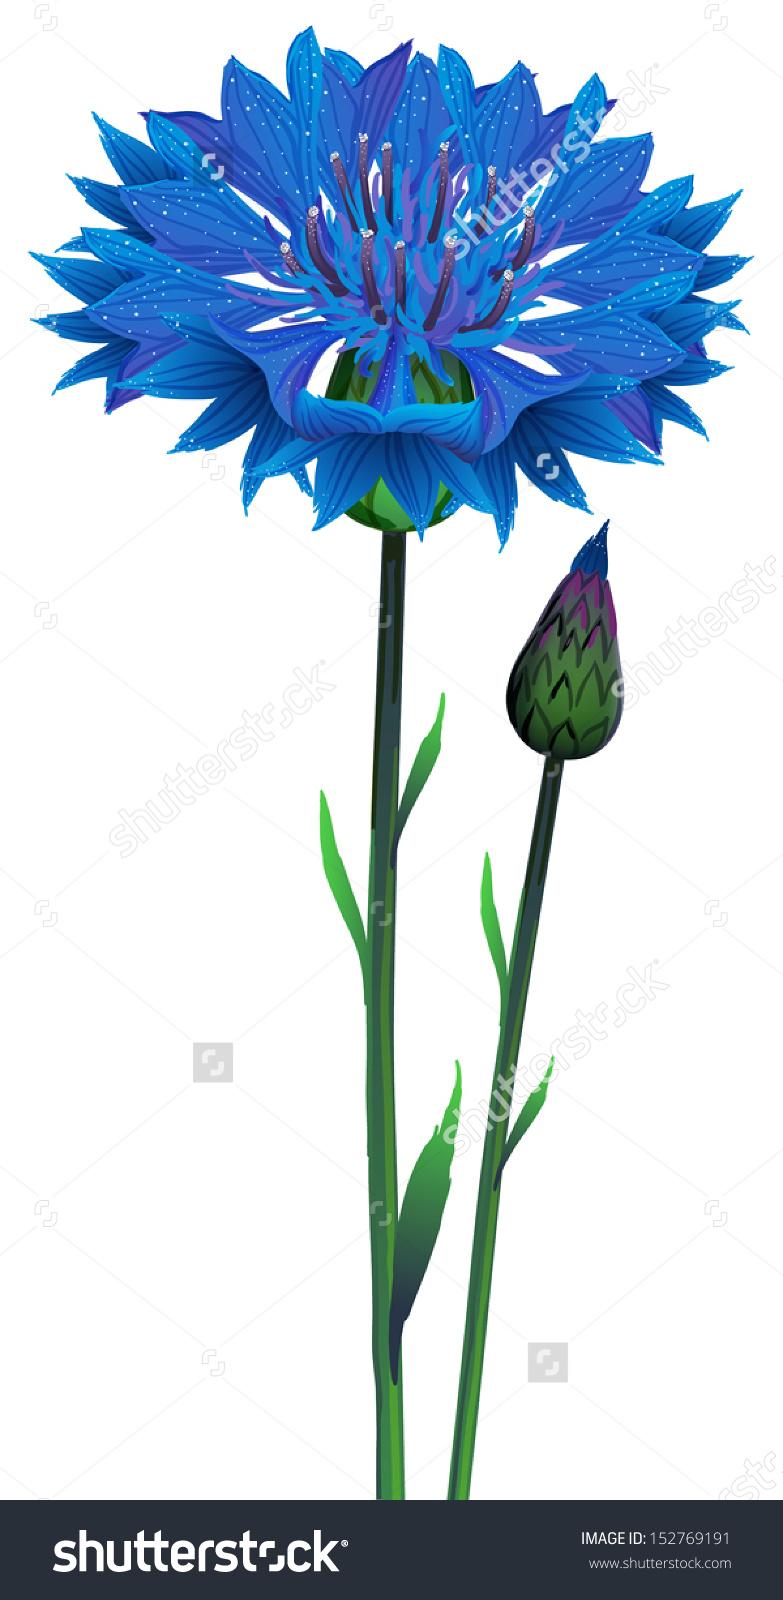 Flowers Blue Cornflower Centaurea Cyanus Vector Stock Vector.